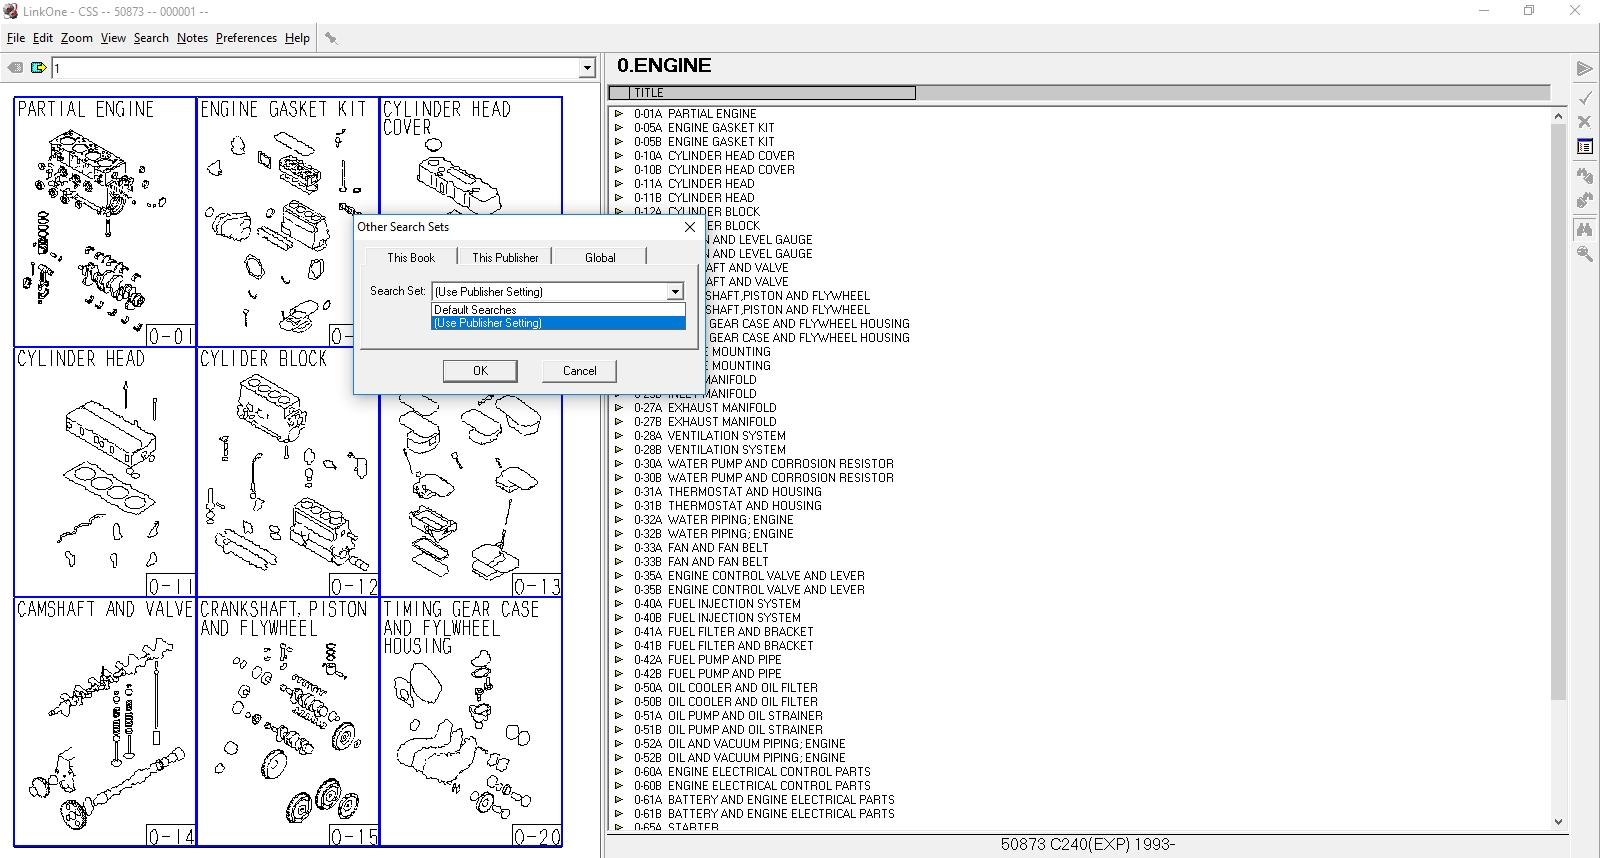 ISUZU_CSS-NET_EPC_052020_Electronic_Parts_Catalog_9